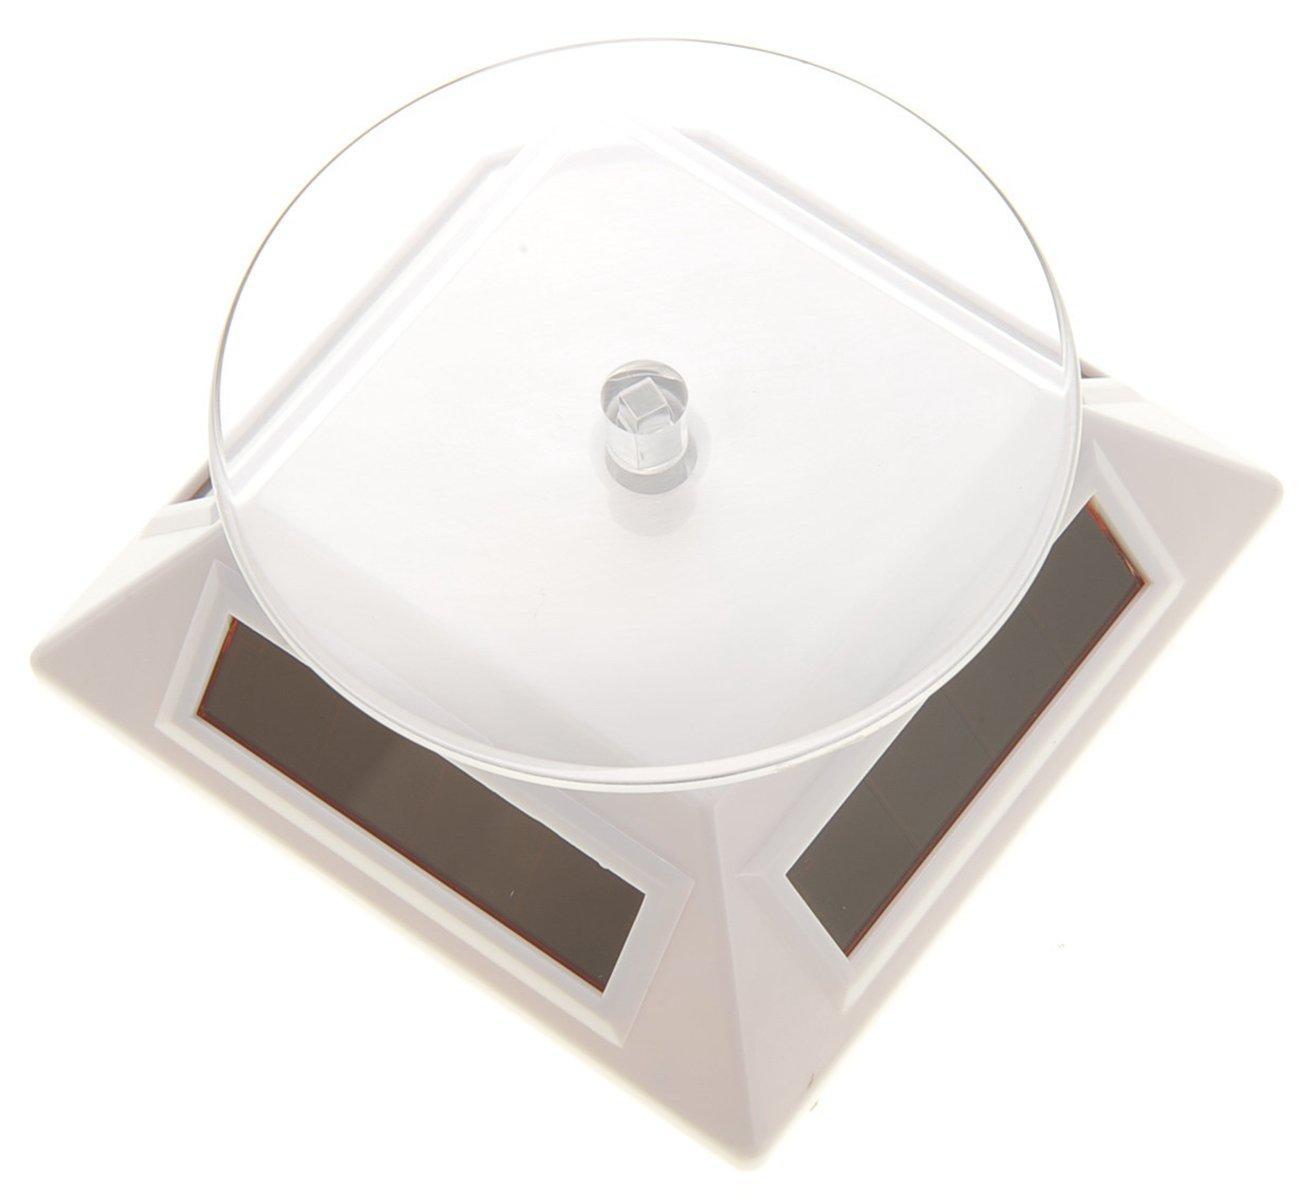 CHIMAERA White Solar Powered Kitchen Display Turntable Stand